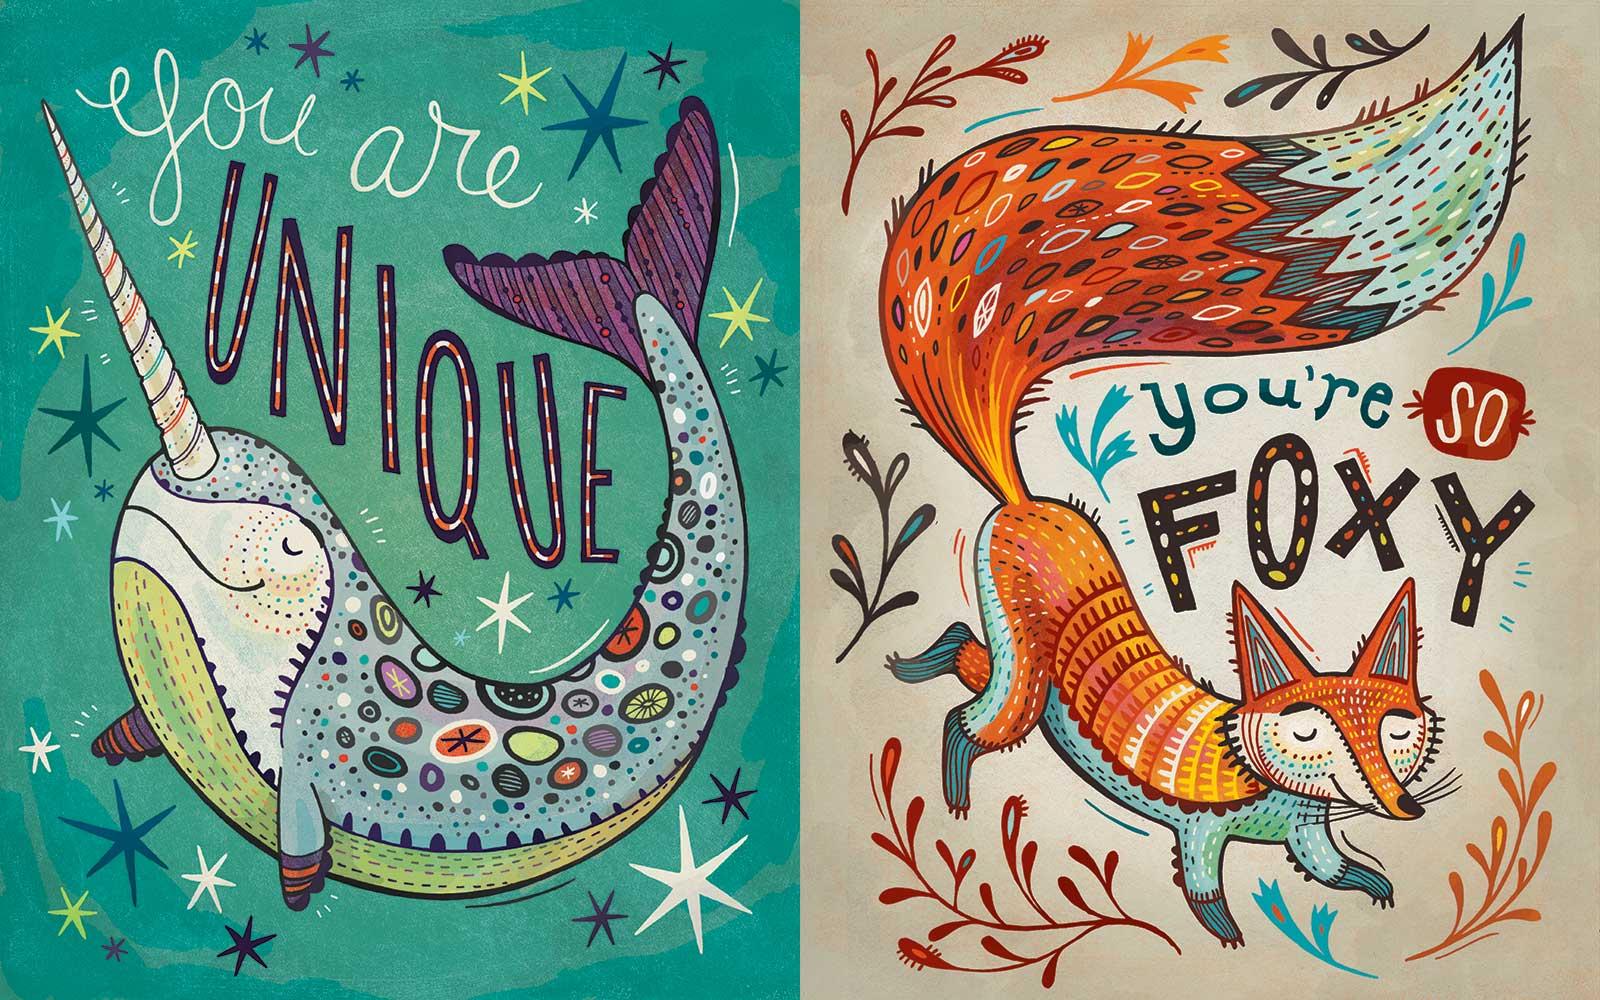 Anni_Betts_Illustration_slide1